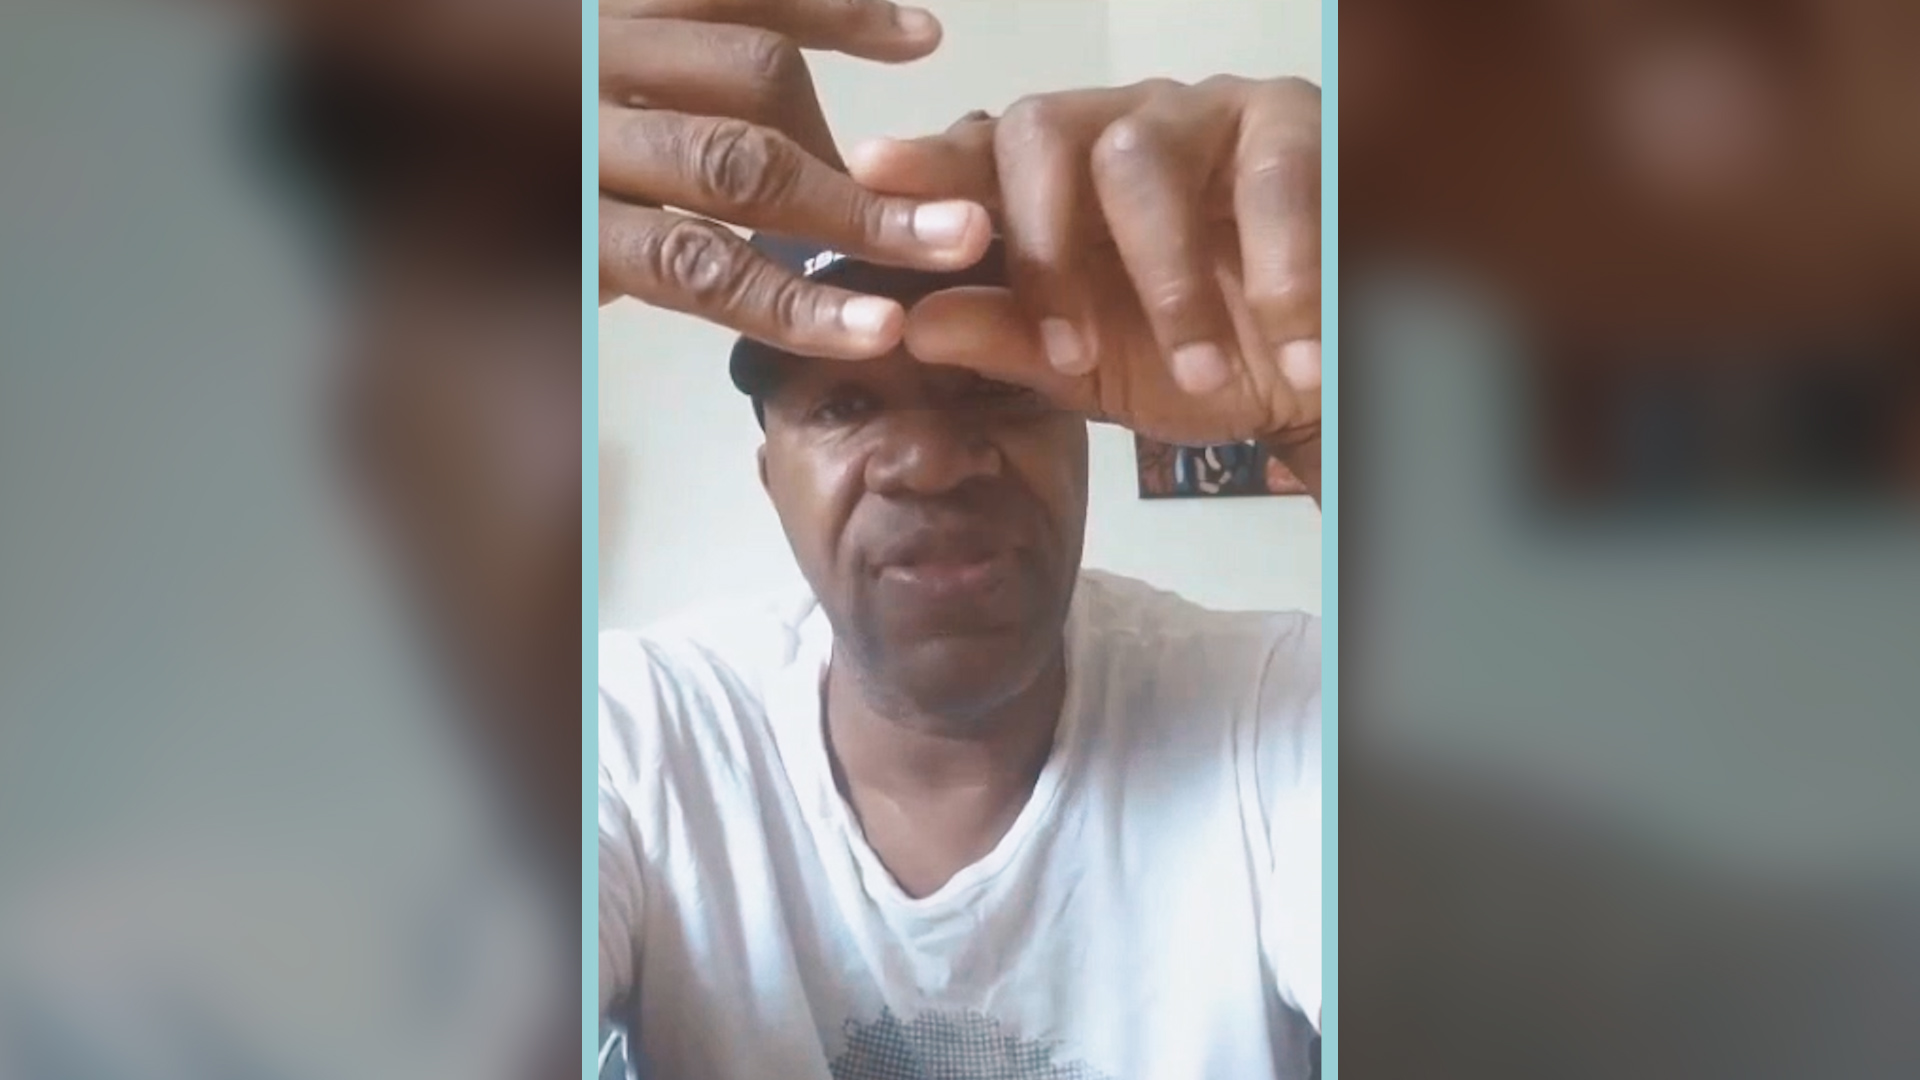 Marvin Washington explaining his finger injuries.